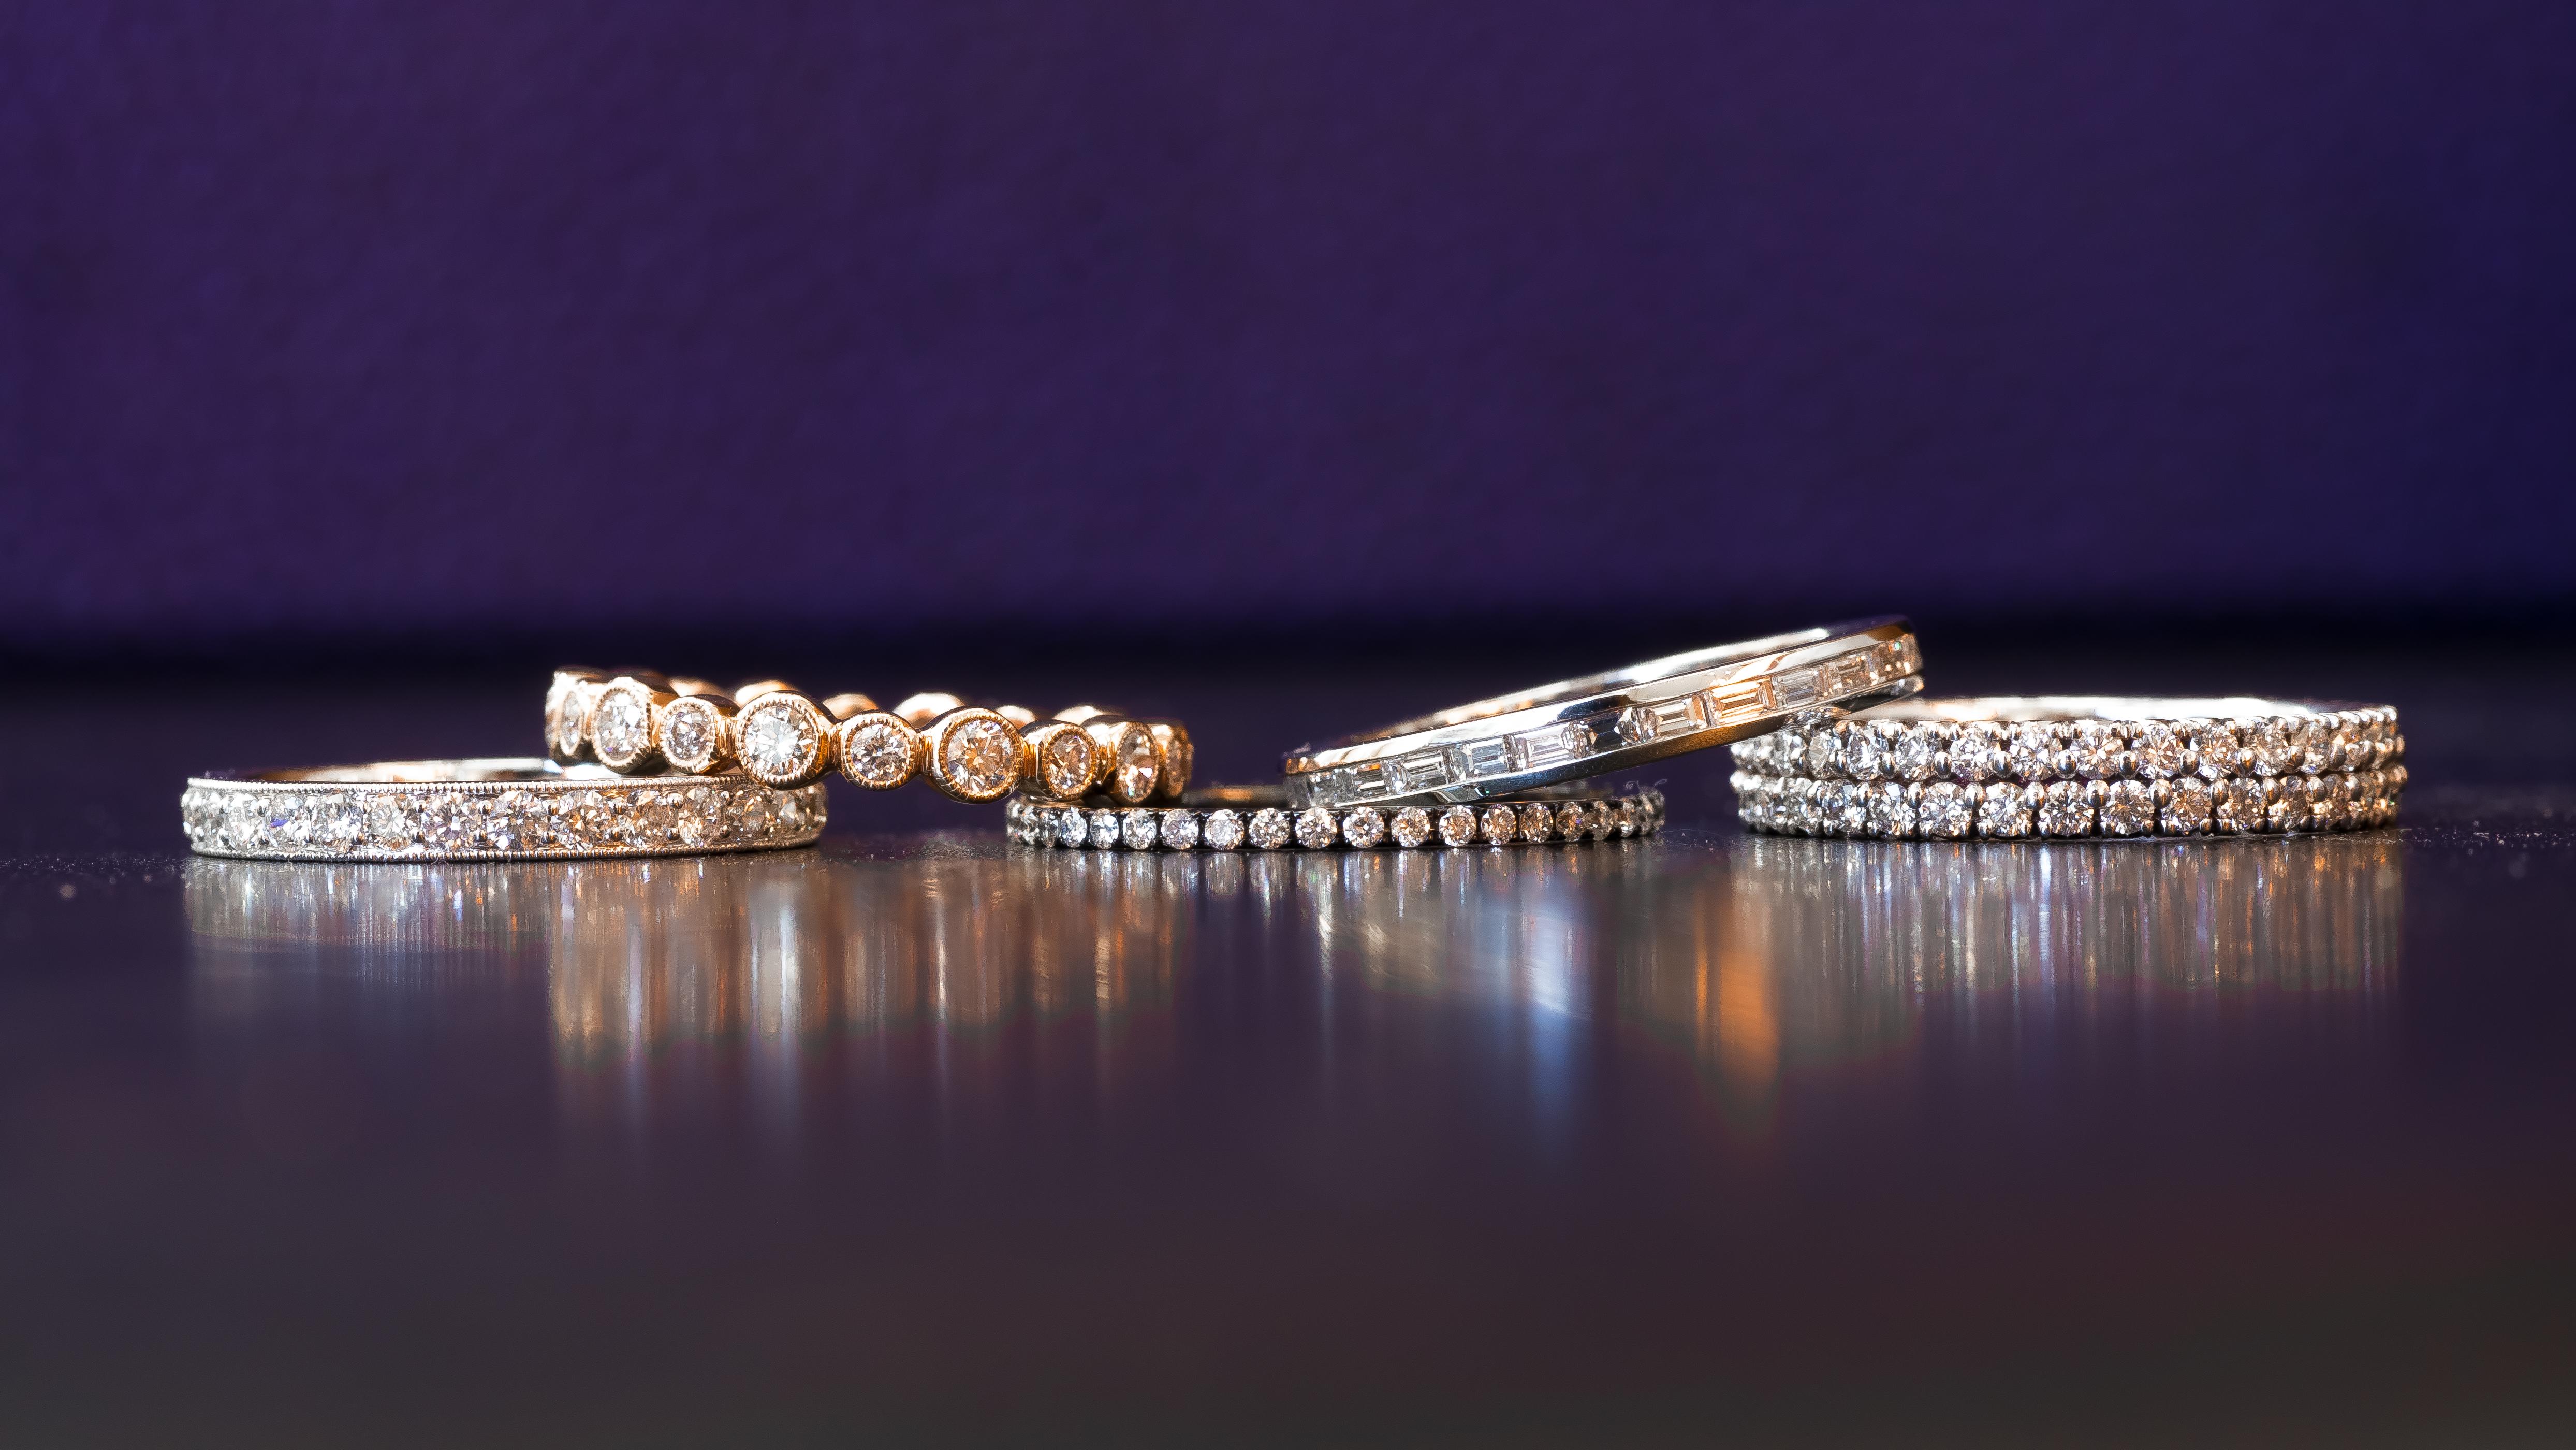 Jewellery Website Background Www Imgkid Com The Image